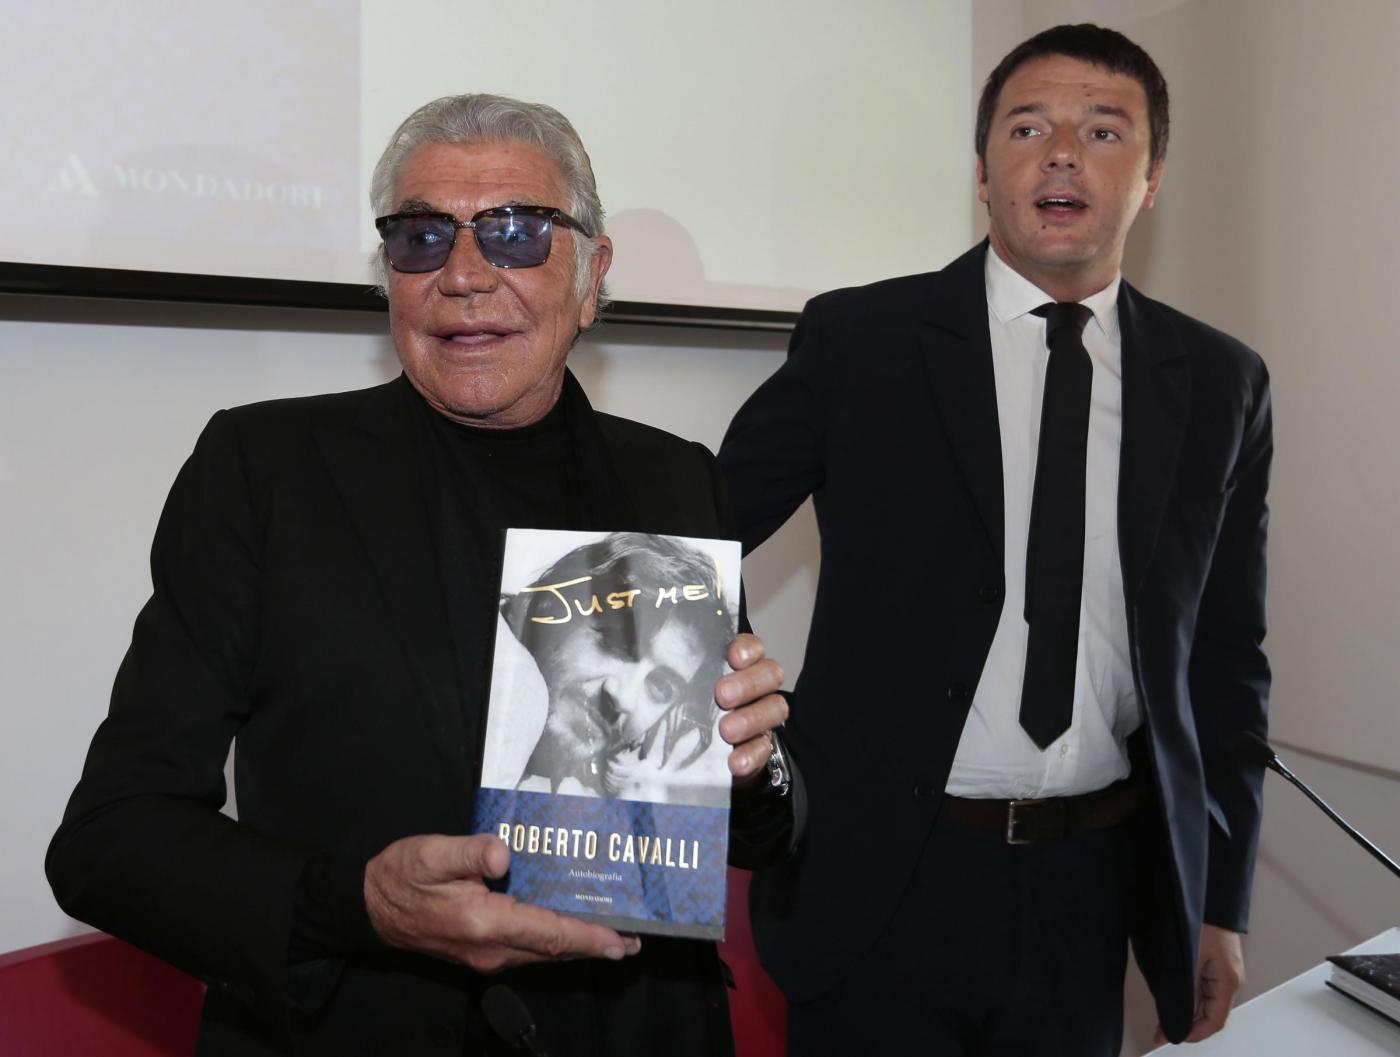 Roberto Cavalli presenta la sua autobiografia: ospite Matteo Renzi 02